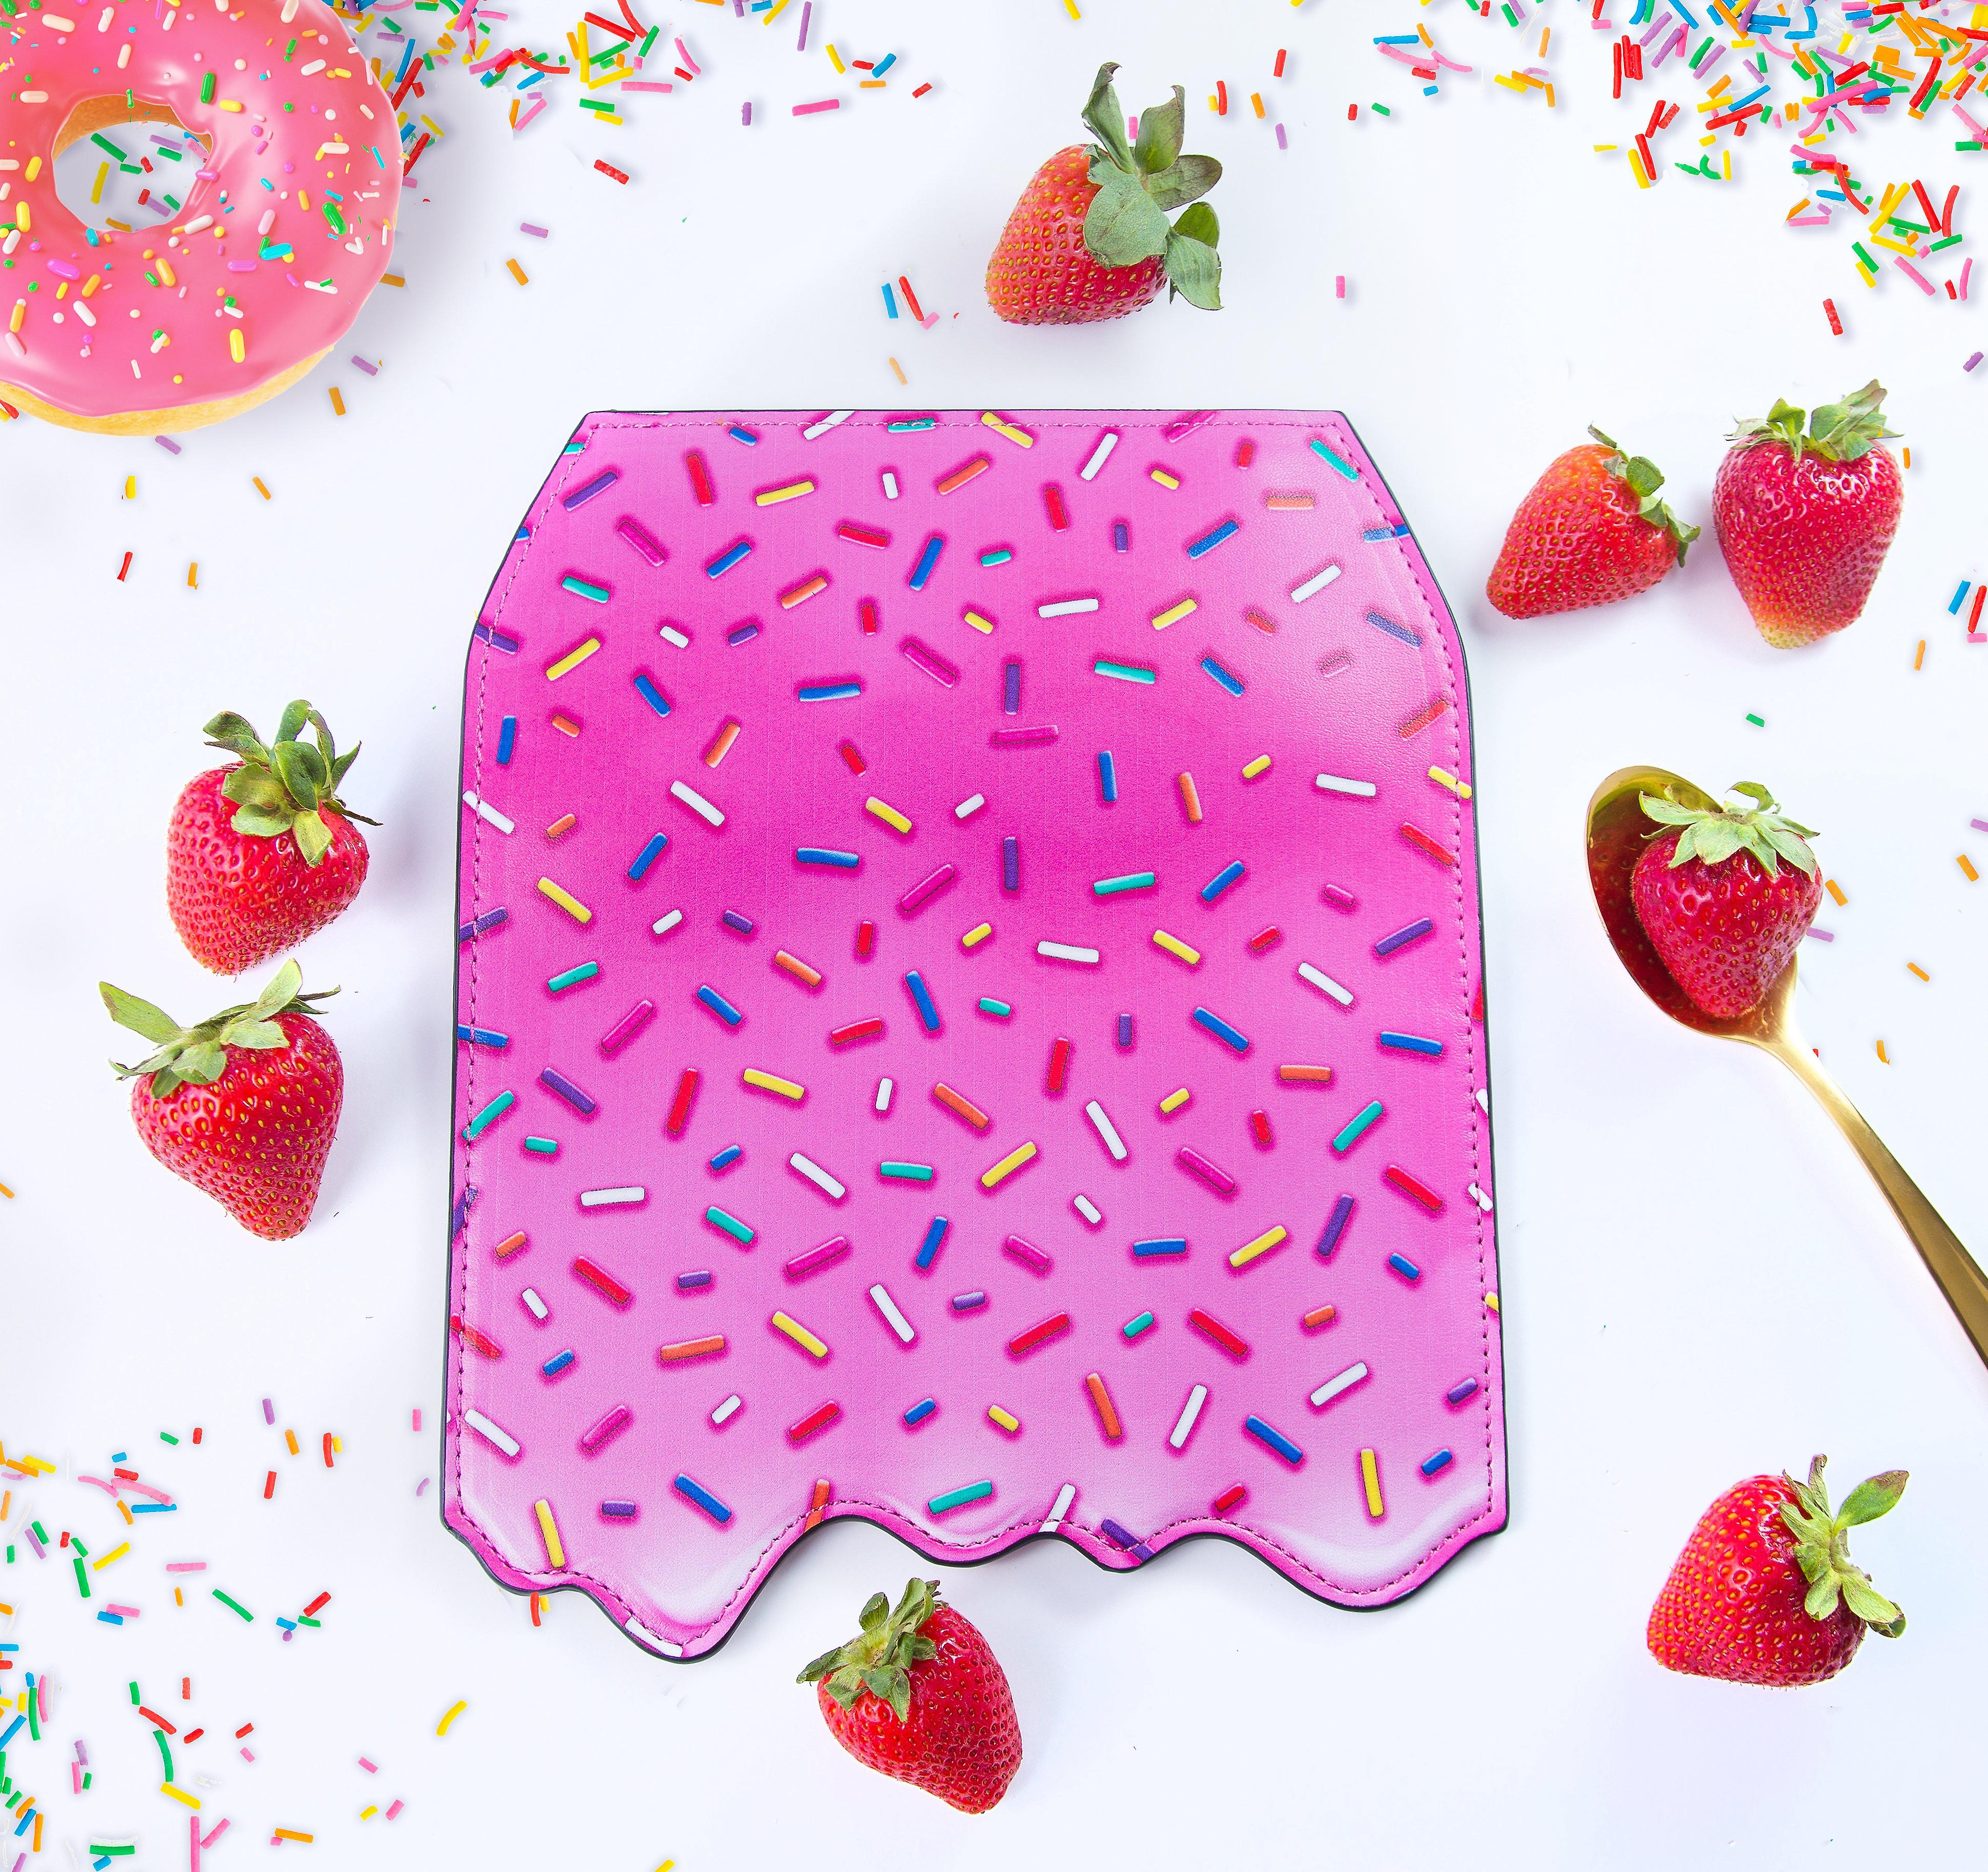 Bake-A-Bag Strawberry Sprinkle Flap